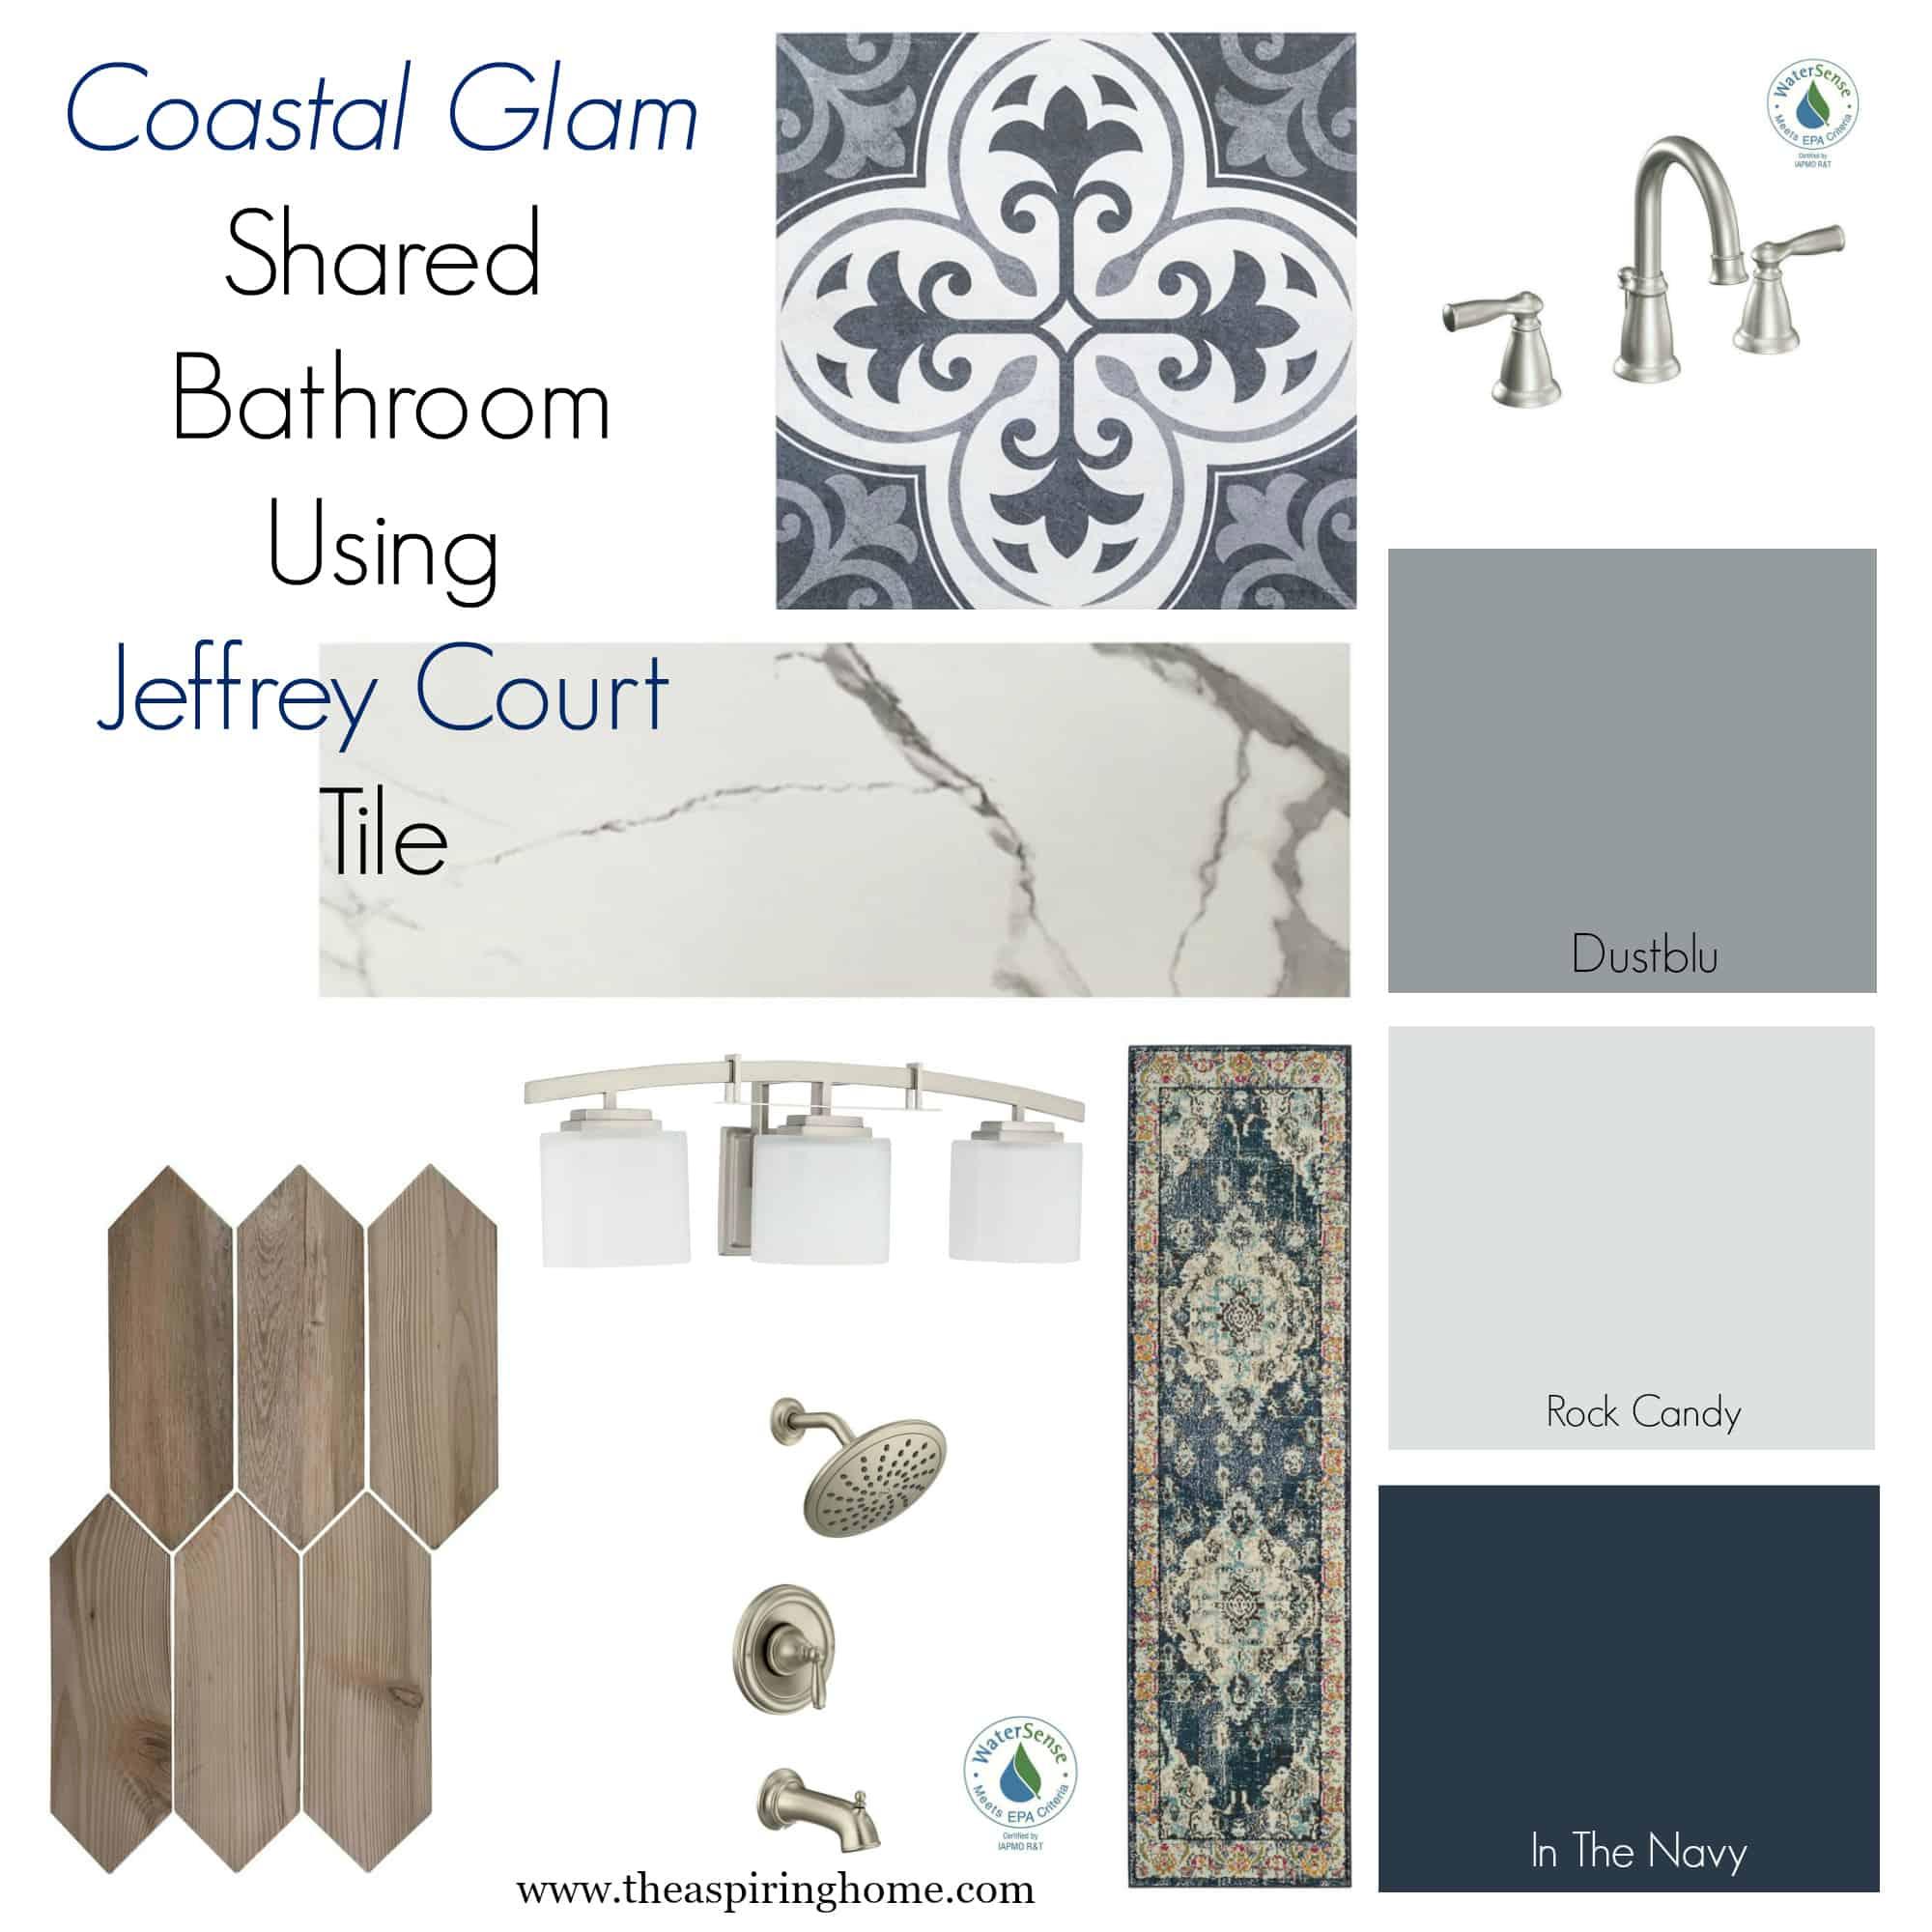 Coastal Glam Shared Bathroom design for ugly duckling bathroom renovation